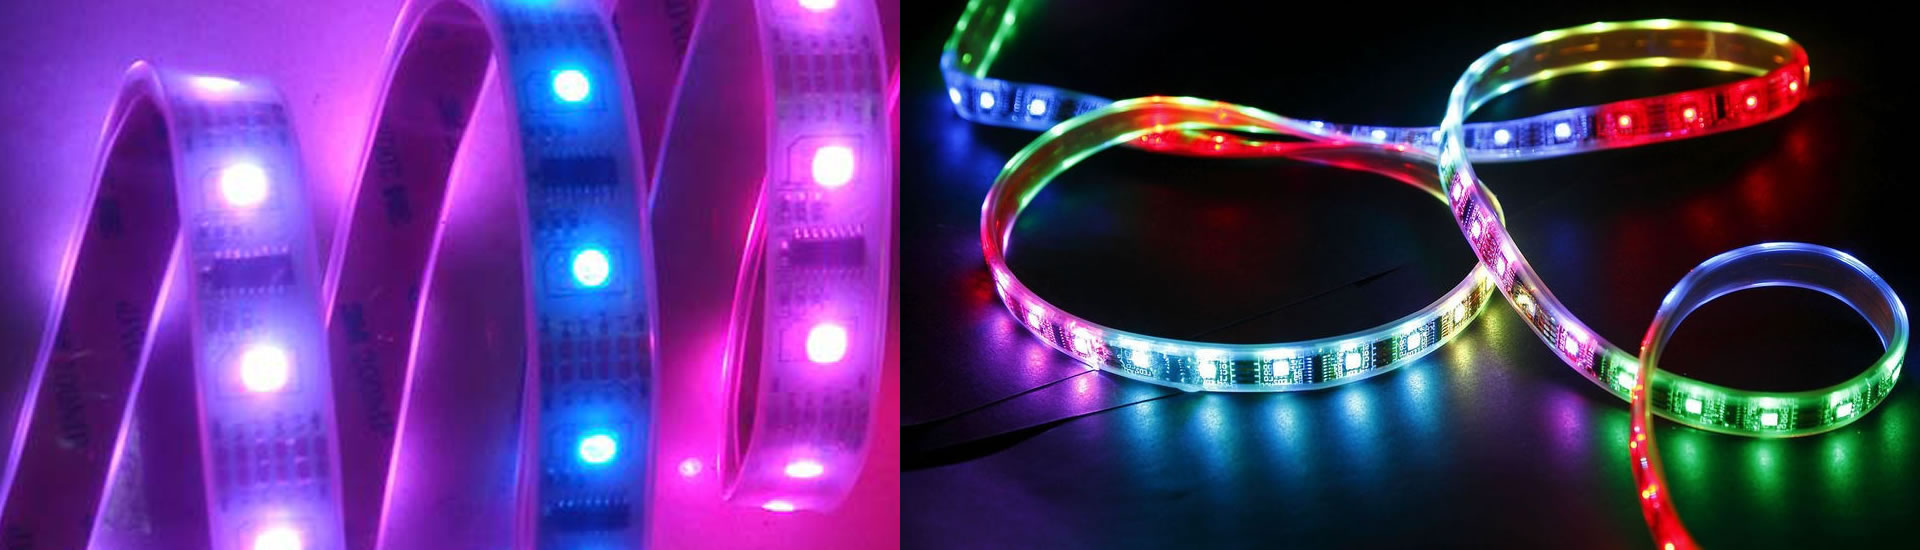 Rubans LED couleurs